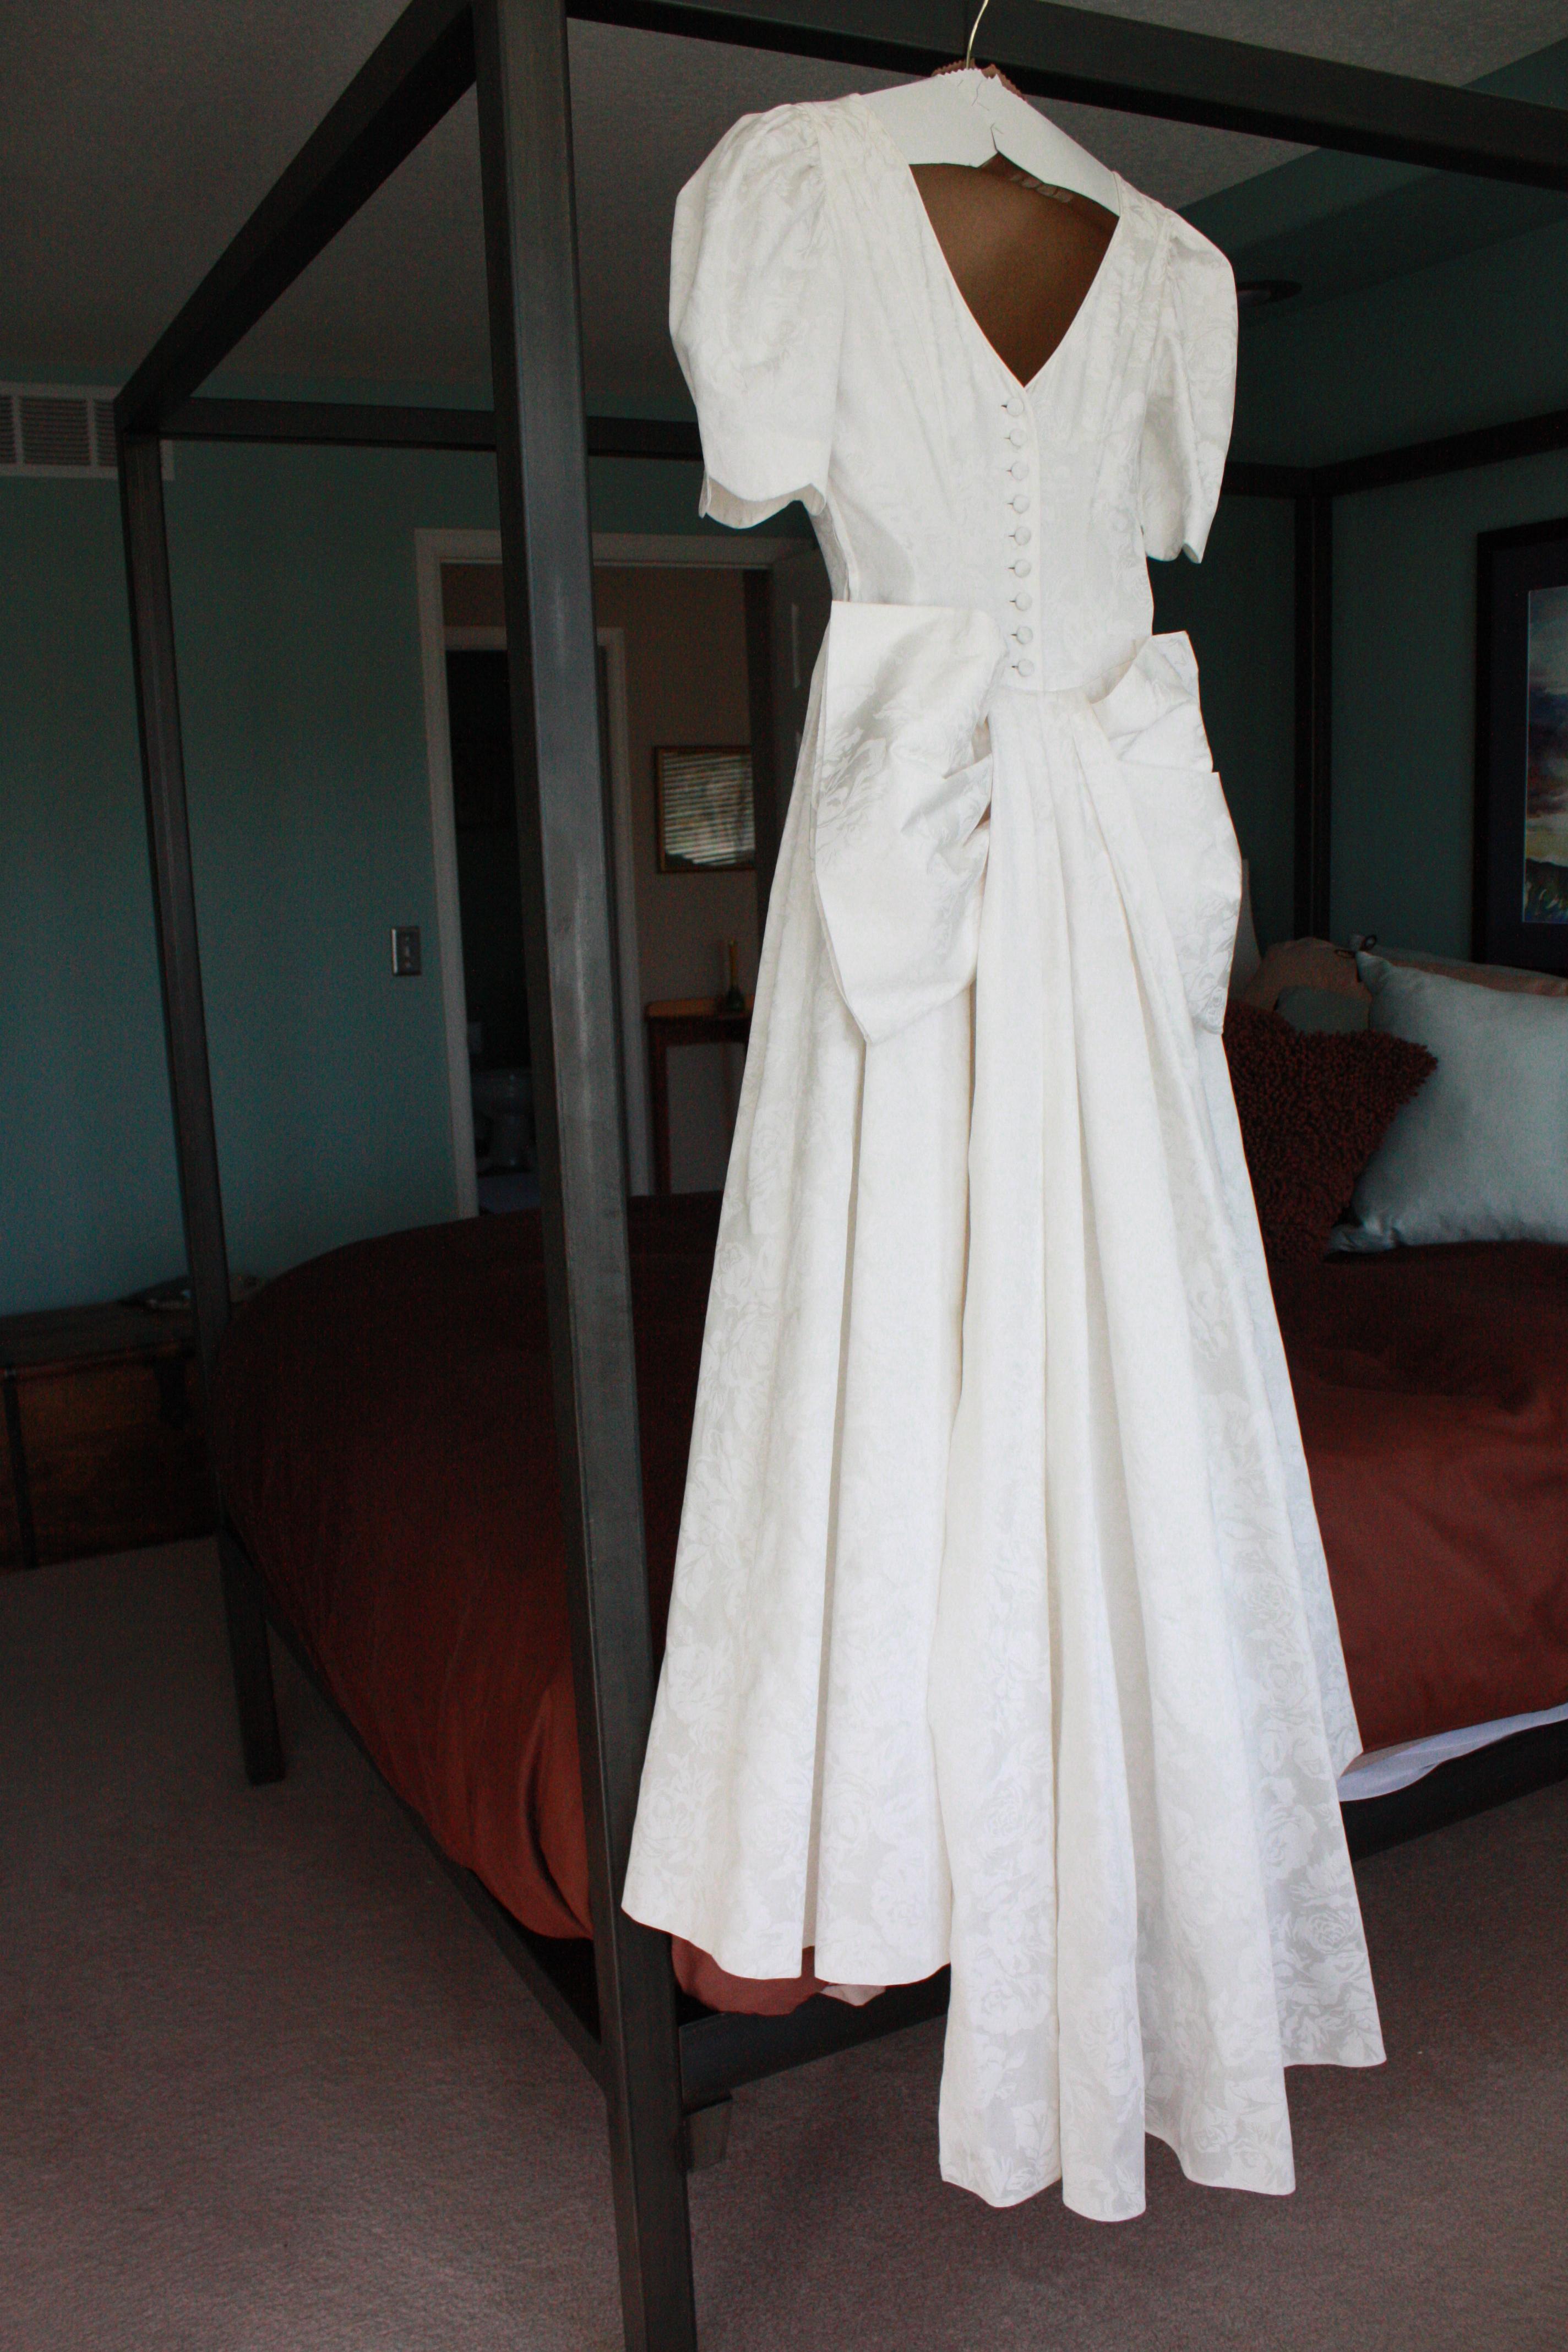 Laura Ashley wedding gown (Vintage?) - Disposer